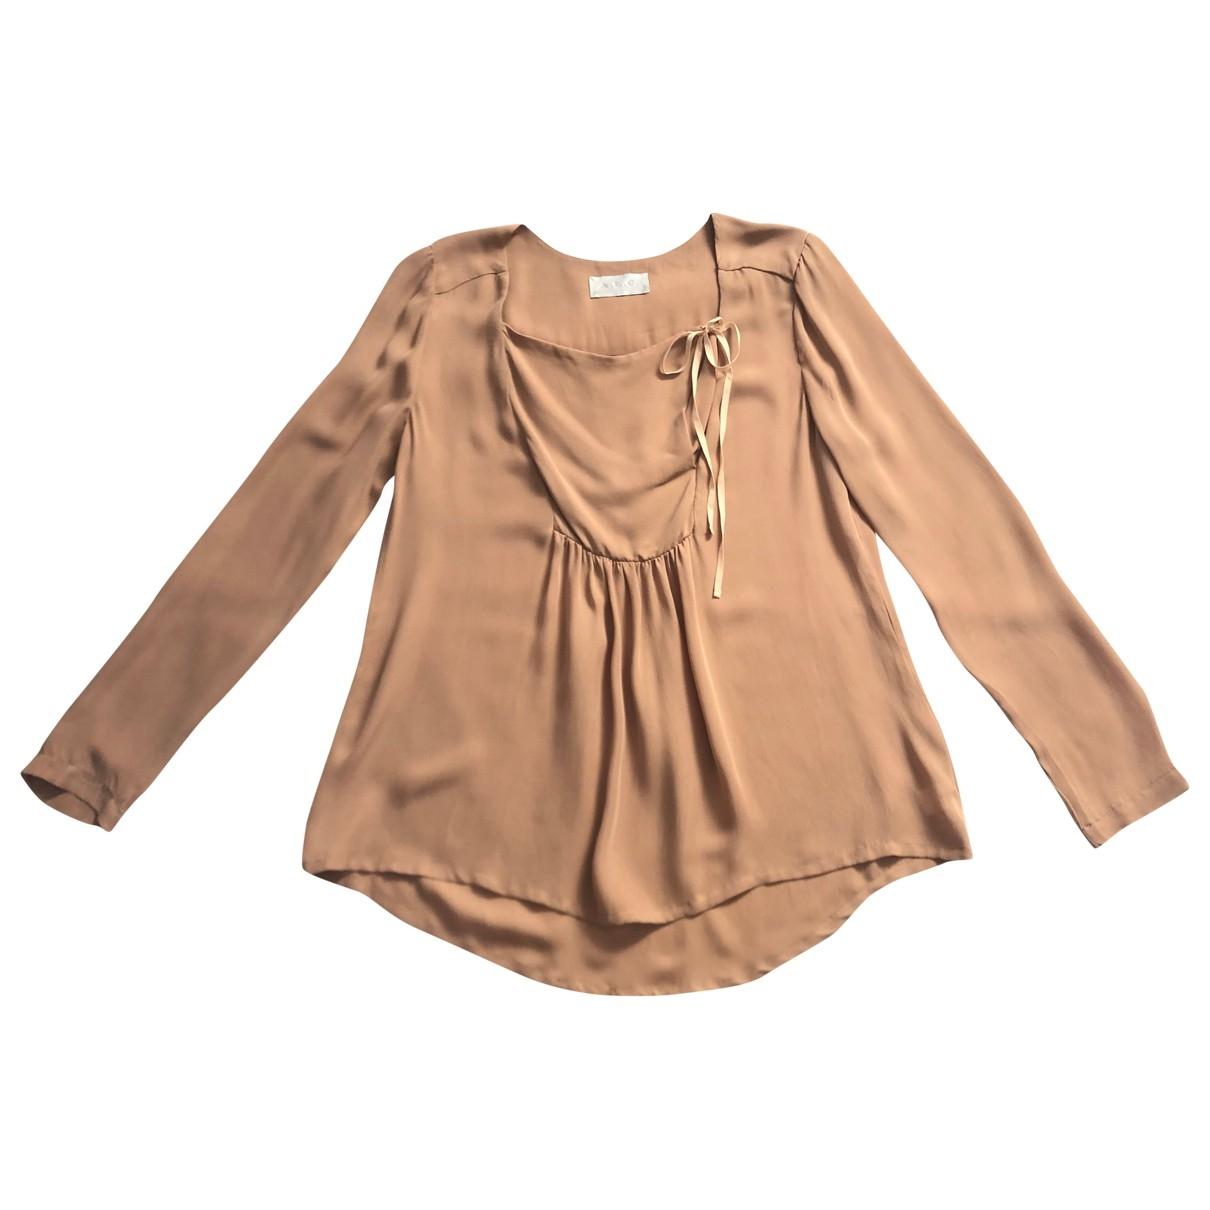 A.l.c \N Camel Silk  top for Women M International